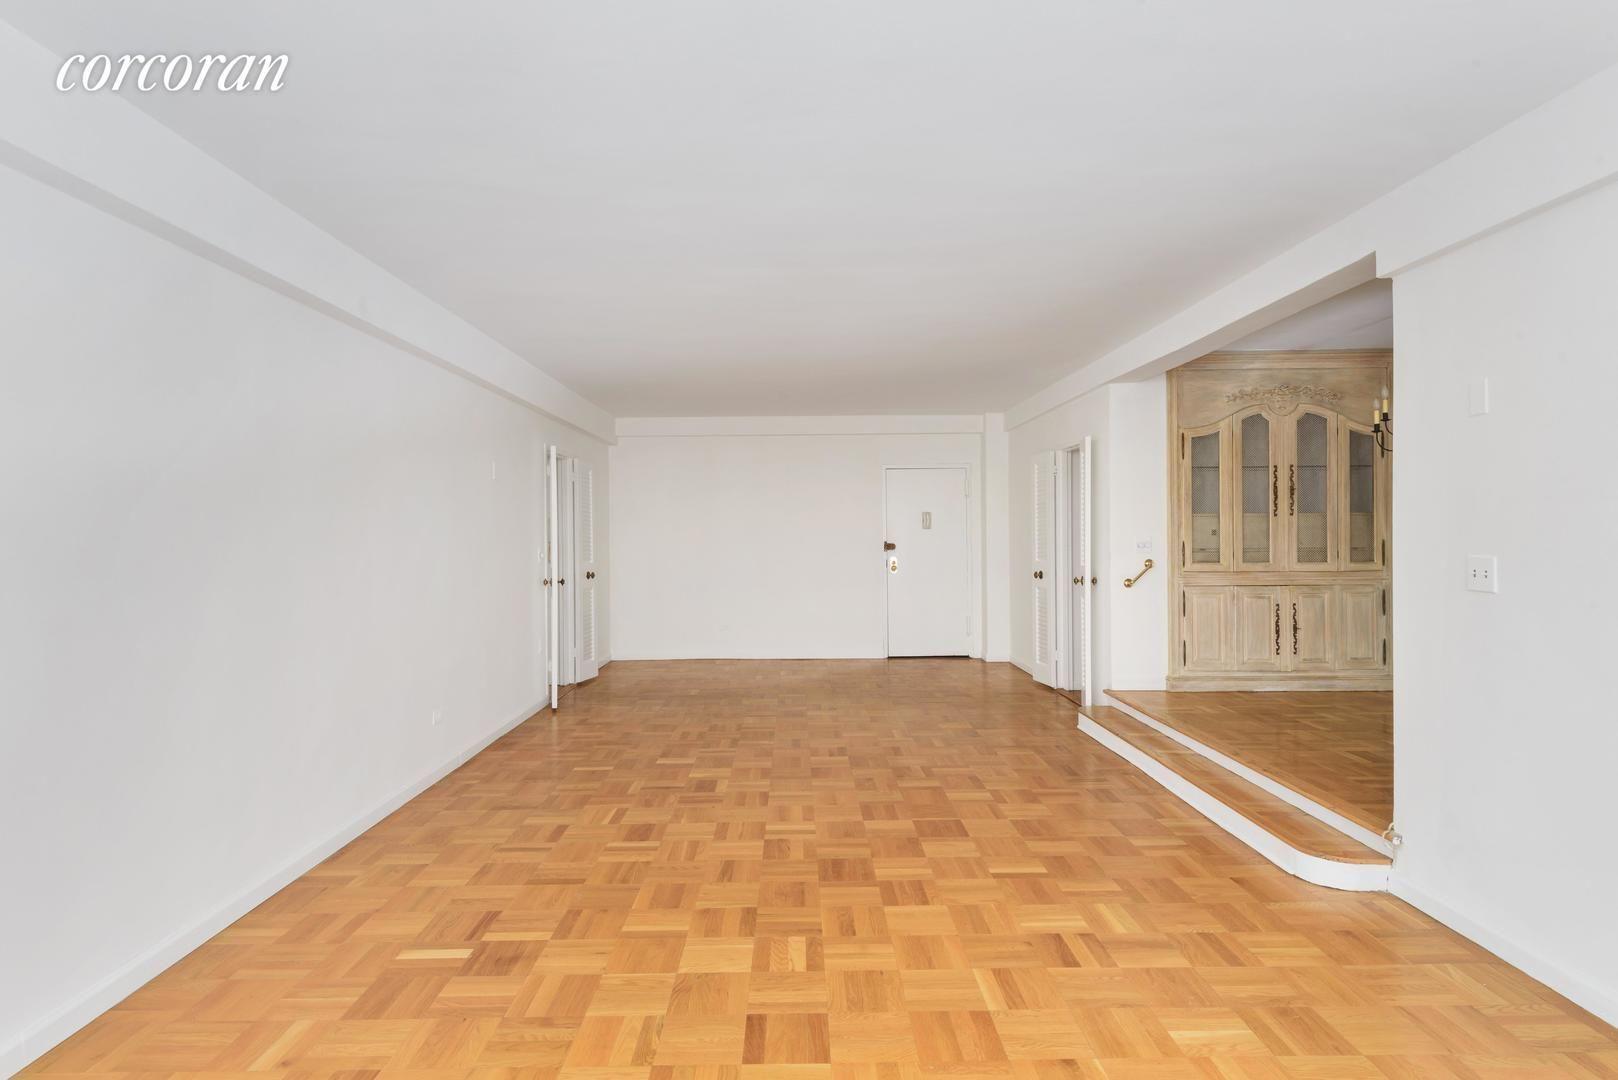 Apartment for sale at 45 Sutton Place South, Apt 2C